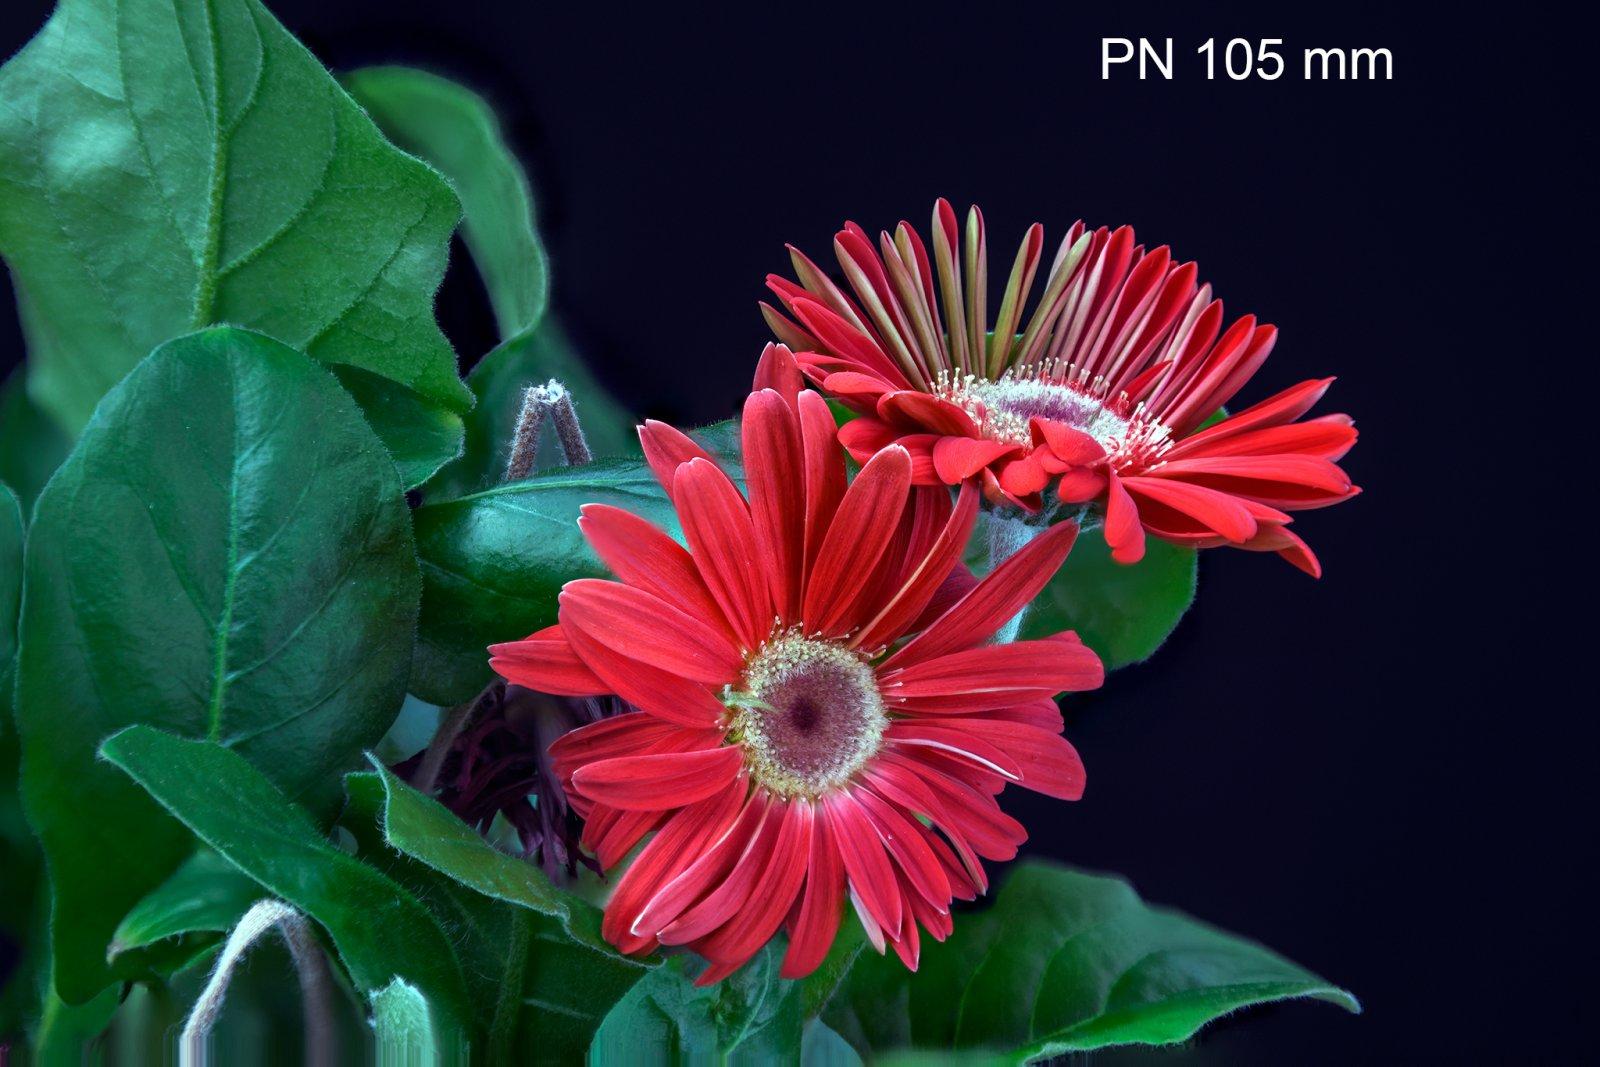 _MEB7927-2-PN105-Bellows-777.jpg